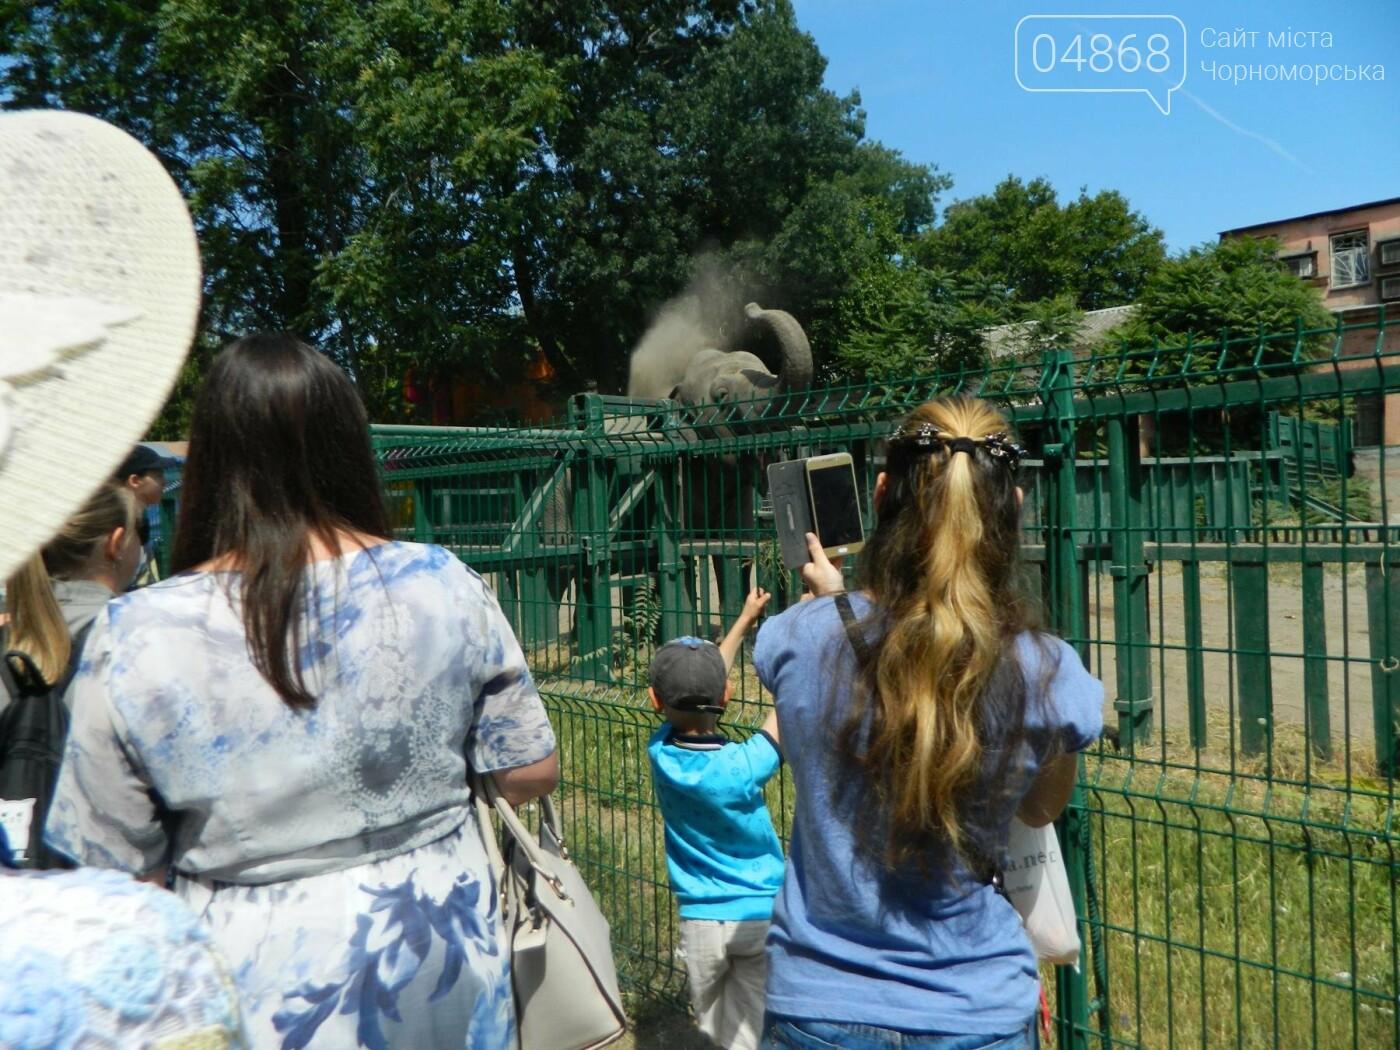 Дети из реабилитационного центра «Радуга» посетили зоопарк, фото-7